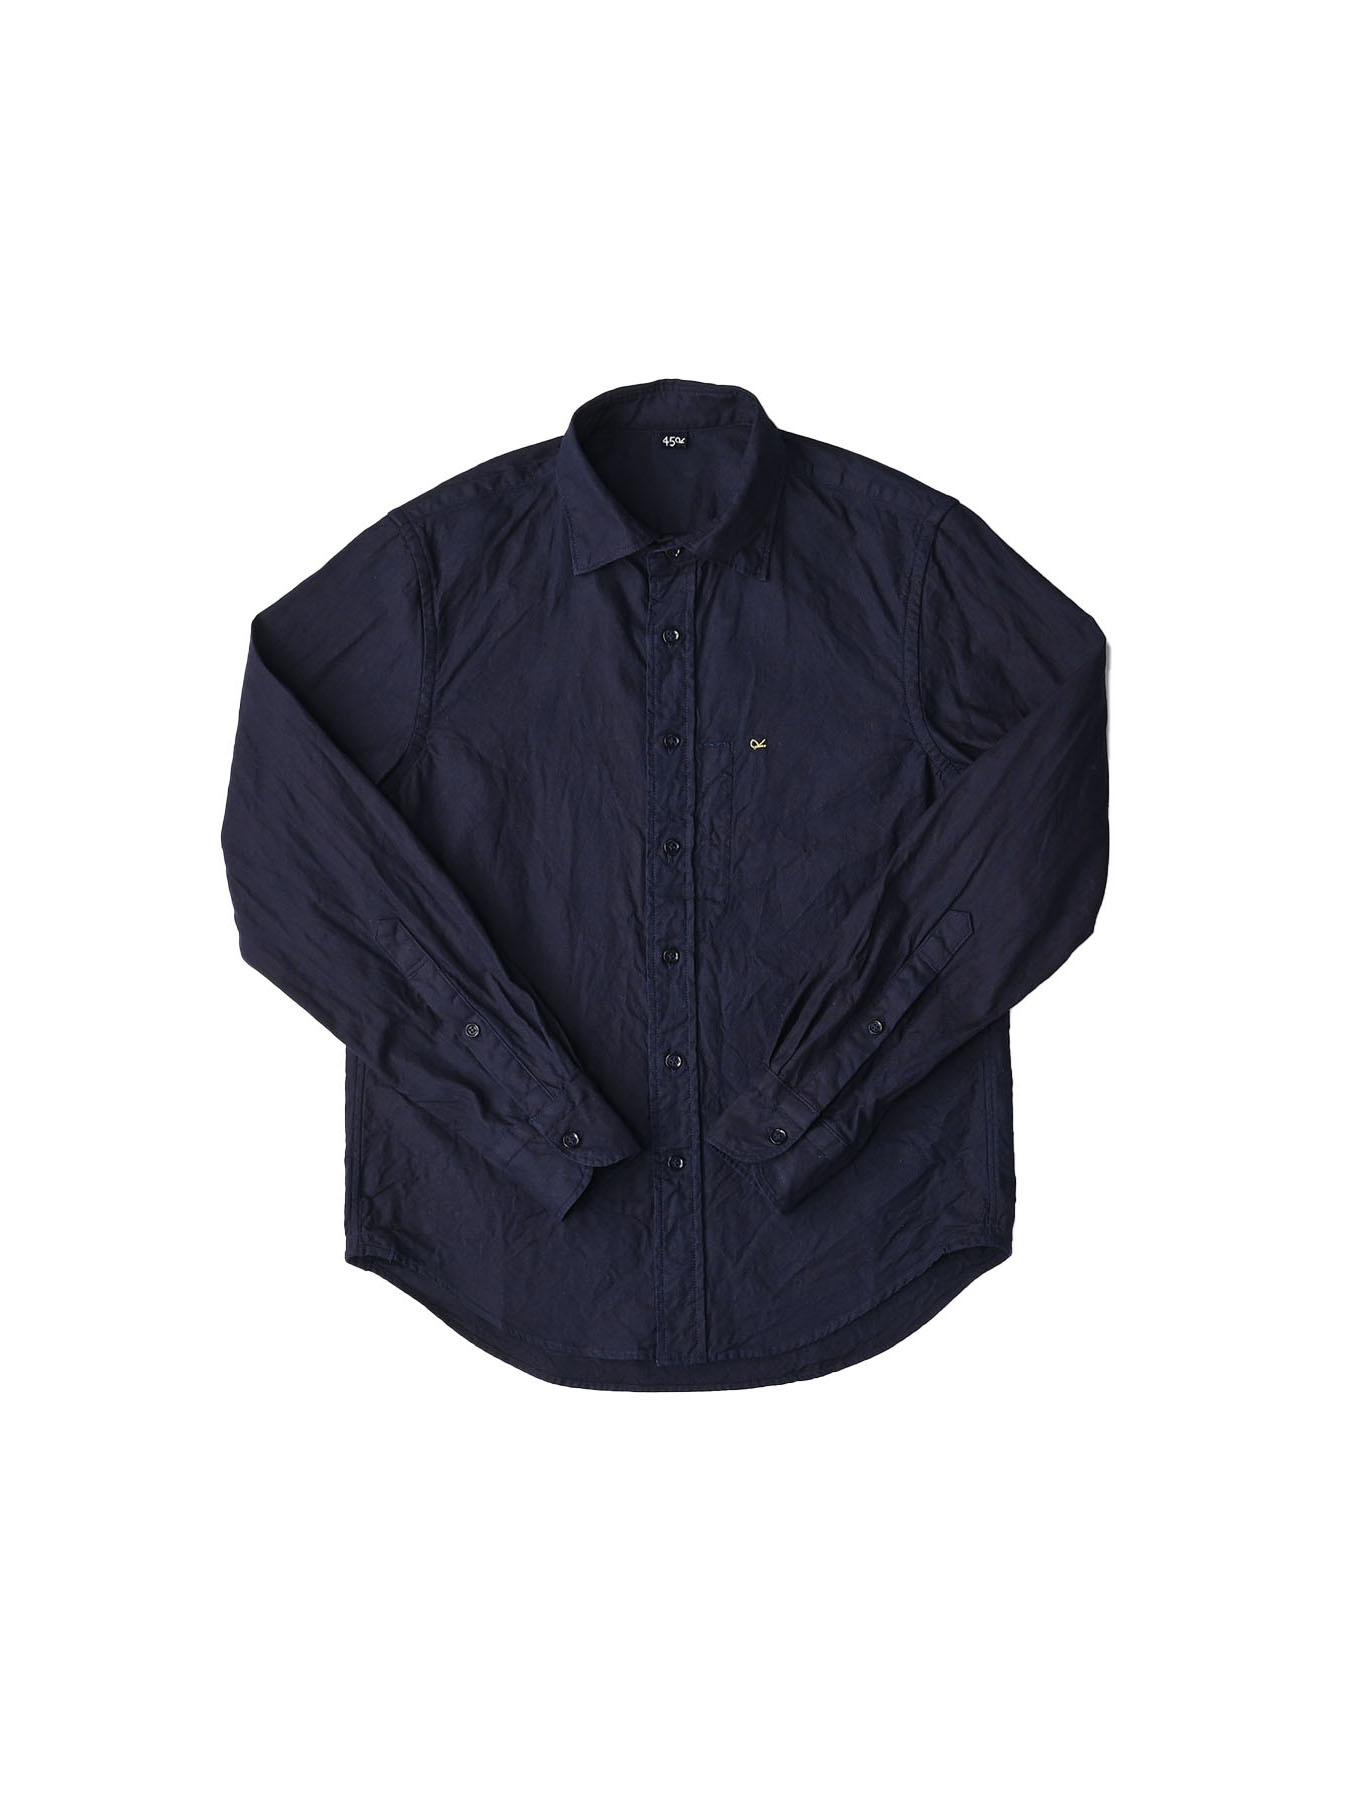 Indigo  Zimbabwe Oxford 908 Regular Shirt-1